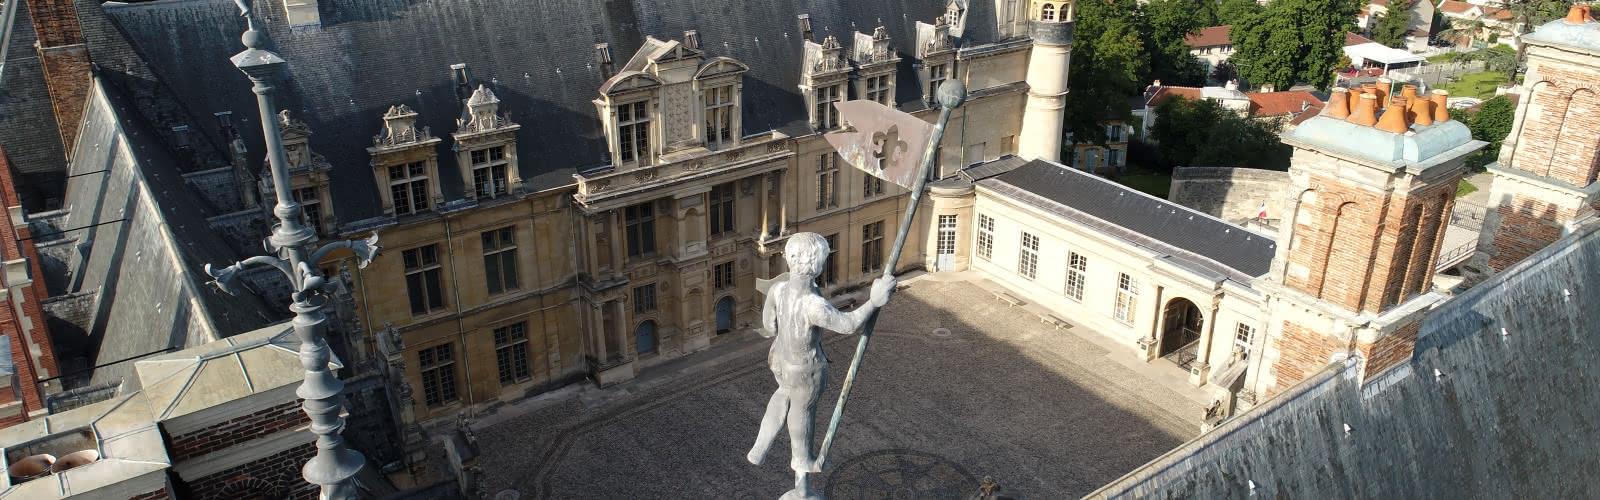 Musée d'Ecouen